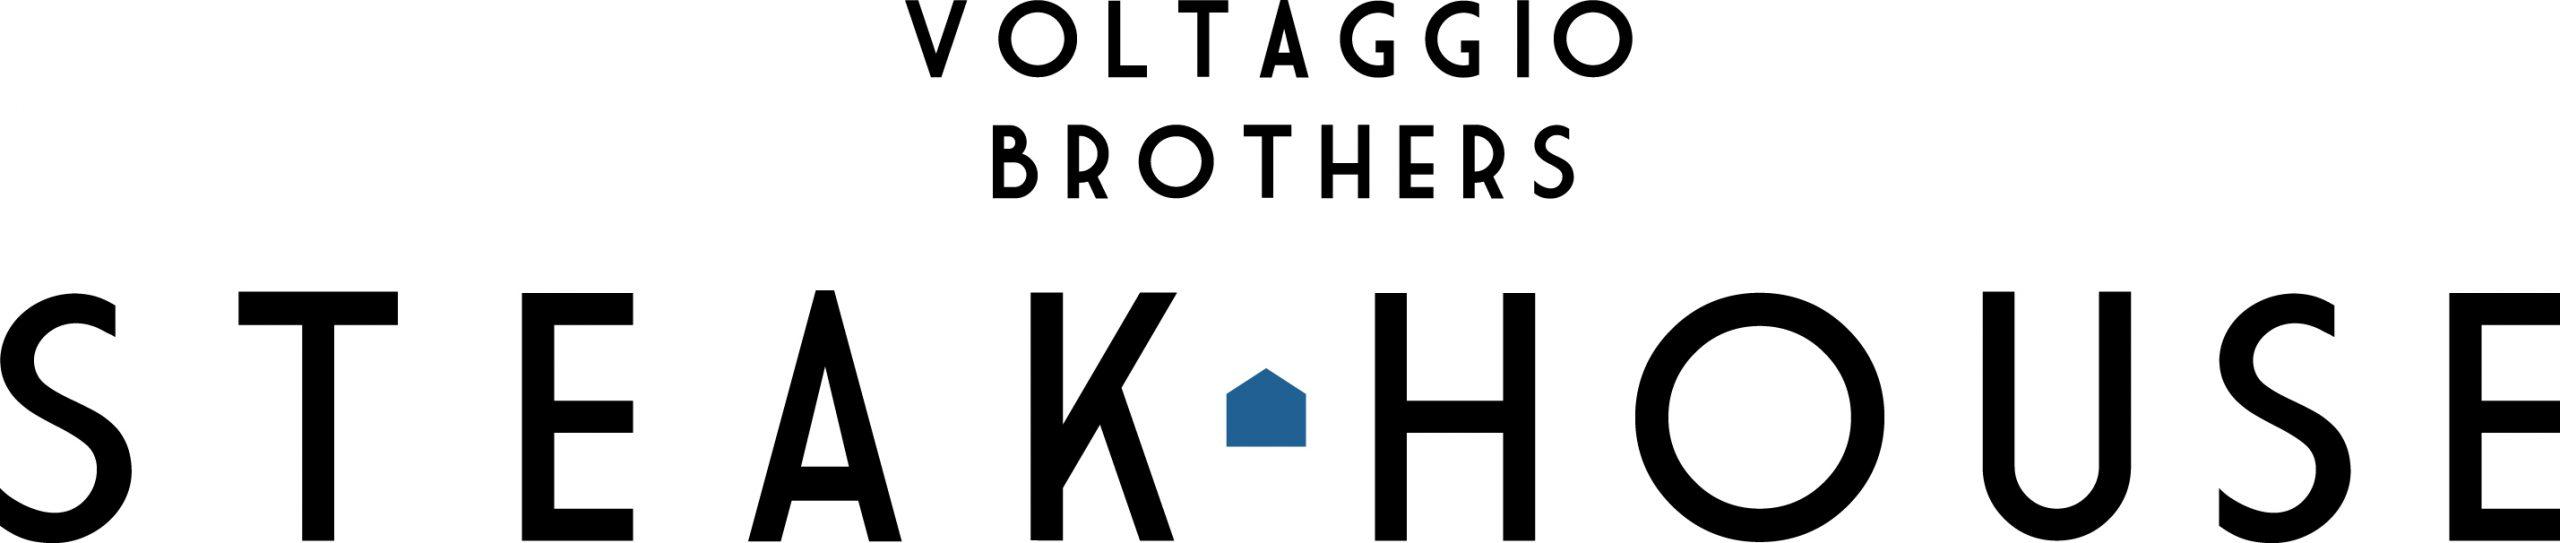 Mixed_Logo_White_Back_Volt_Brothers_Steak_House